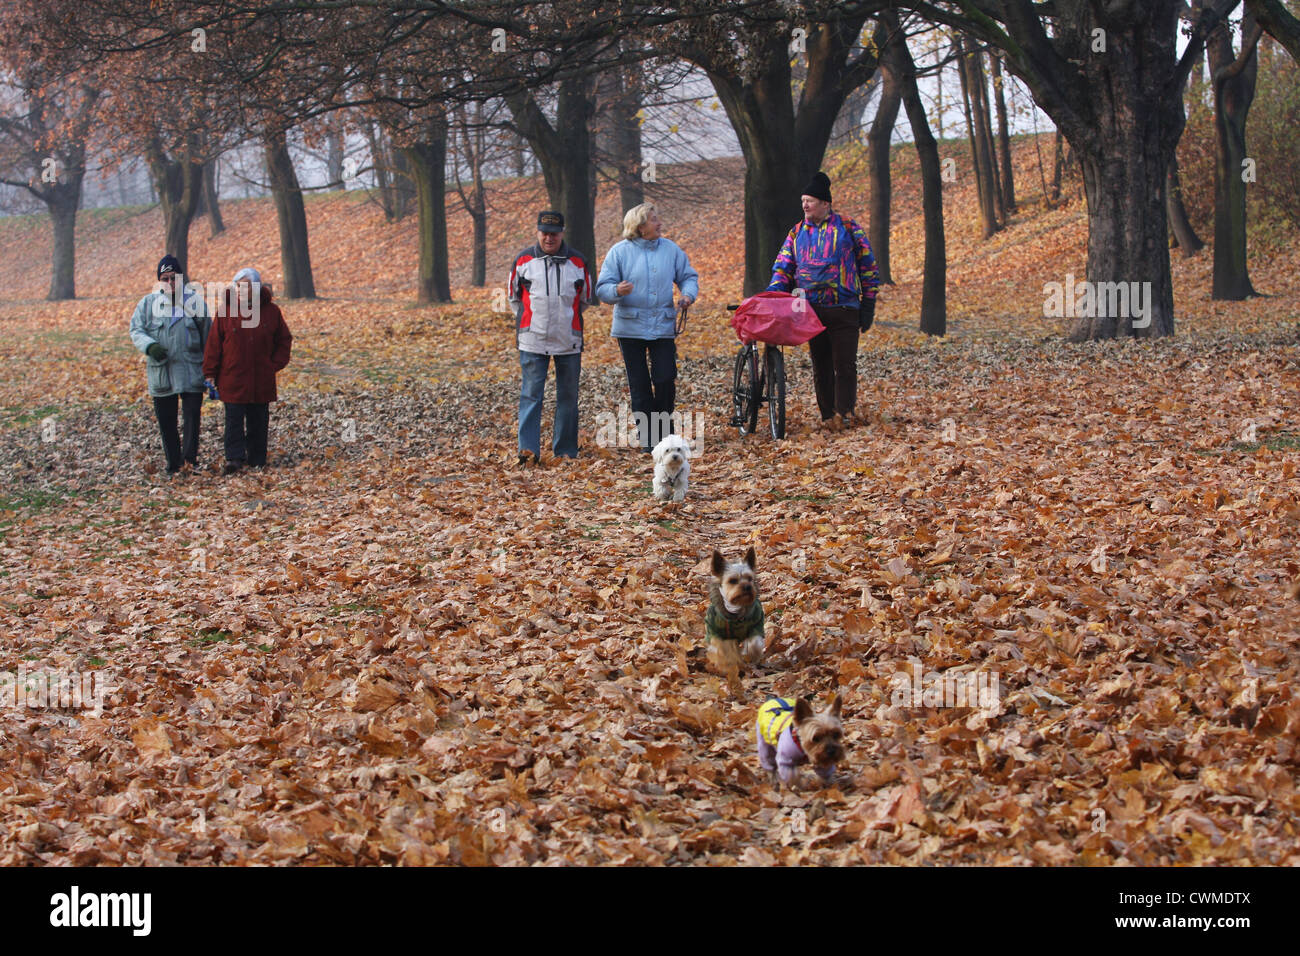 Autumn in Park - Stock Image